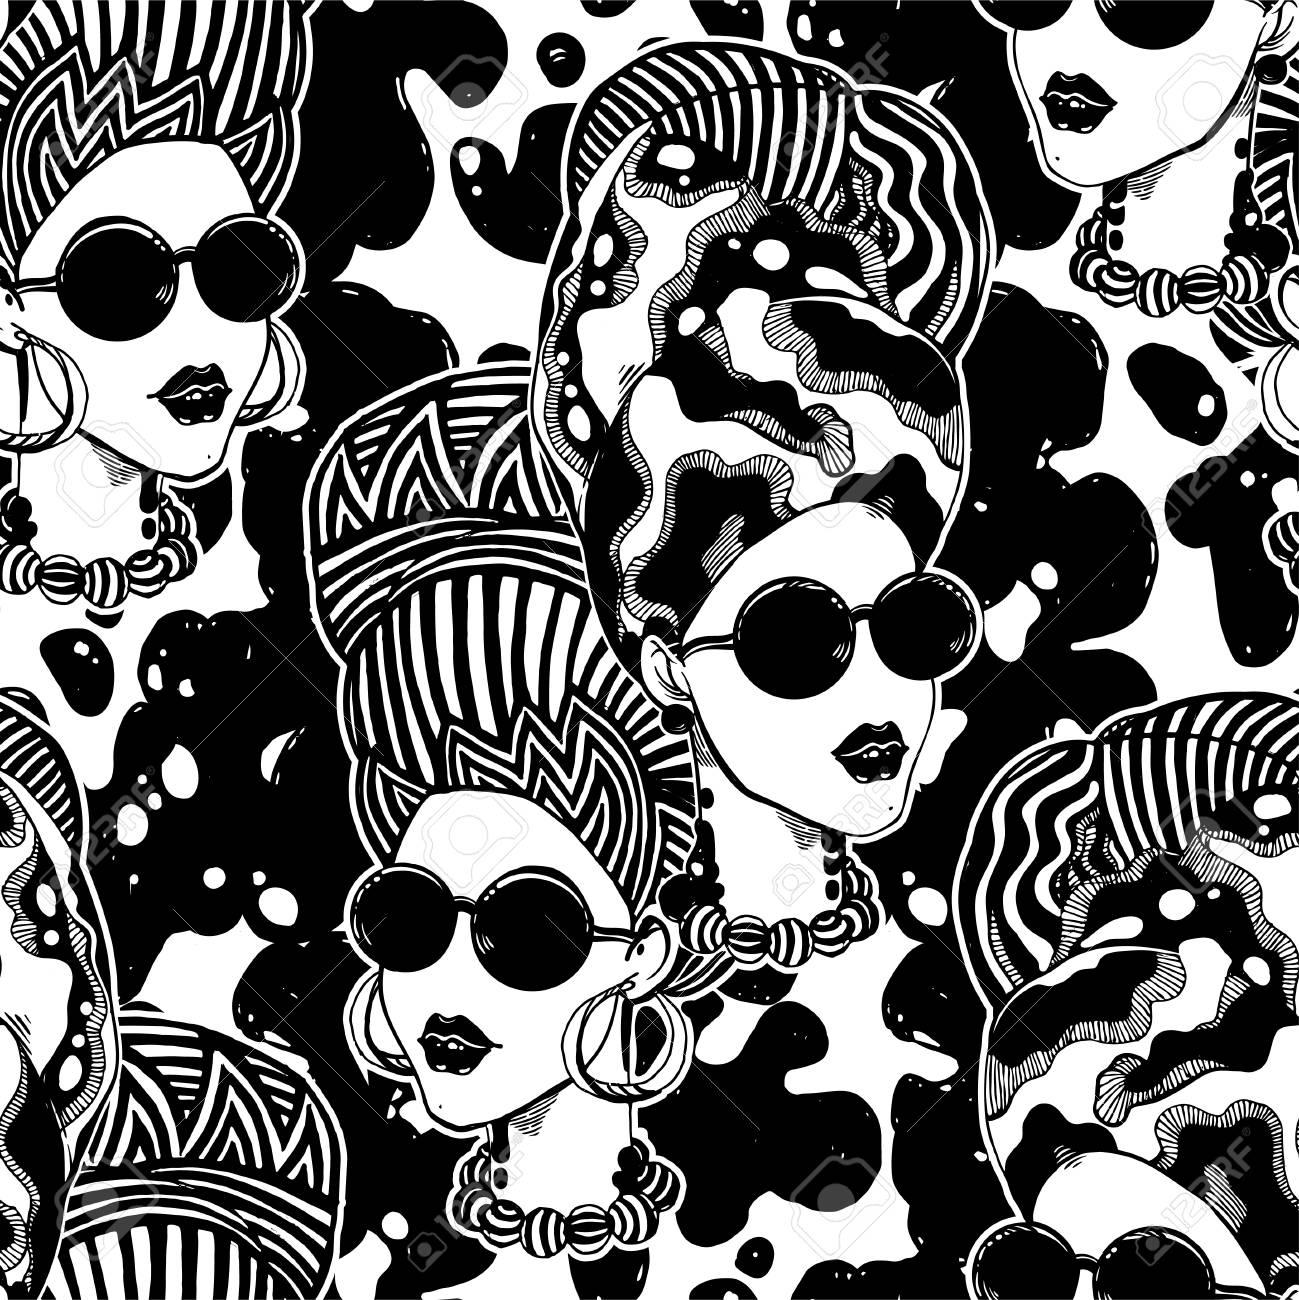 Headwrap Stock Illustrations – 166 Headwrap Stock Illustrations, Vectors &  Clipart - Dreamstime